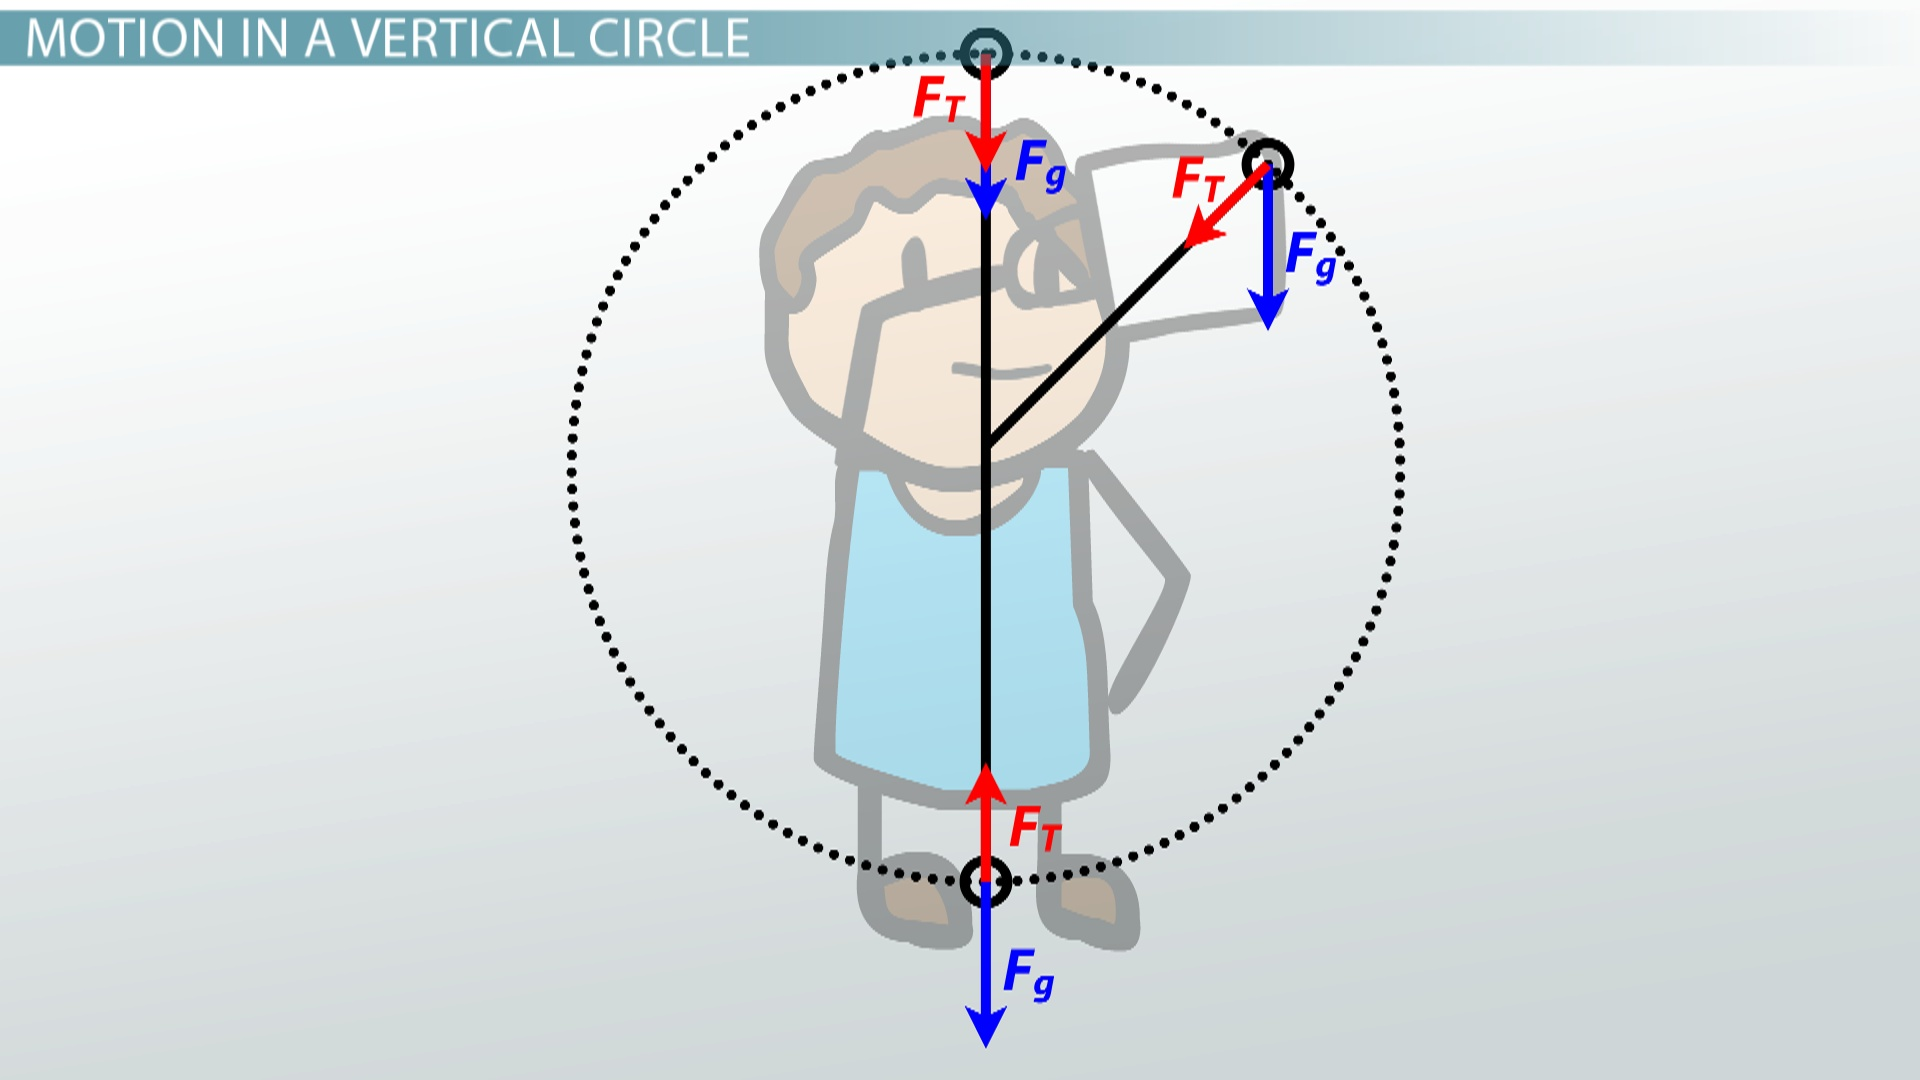 Mathematics Of Circular Motion Worksheet Answers